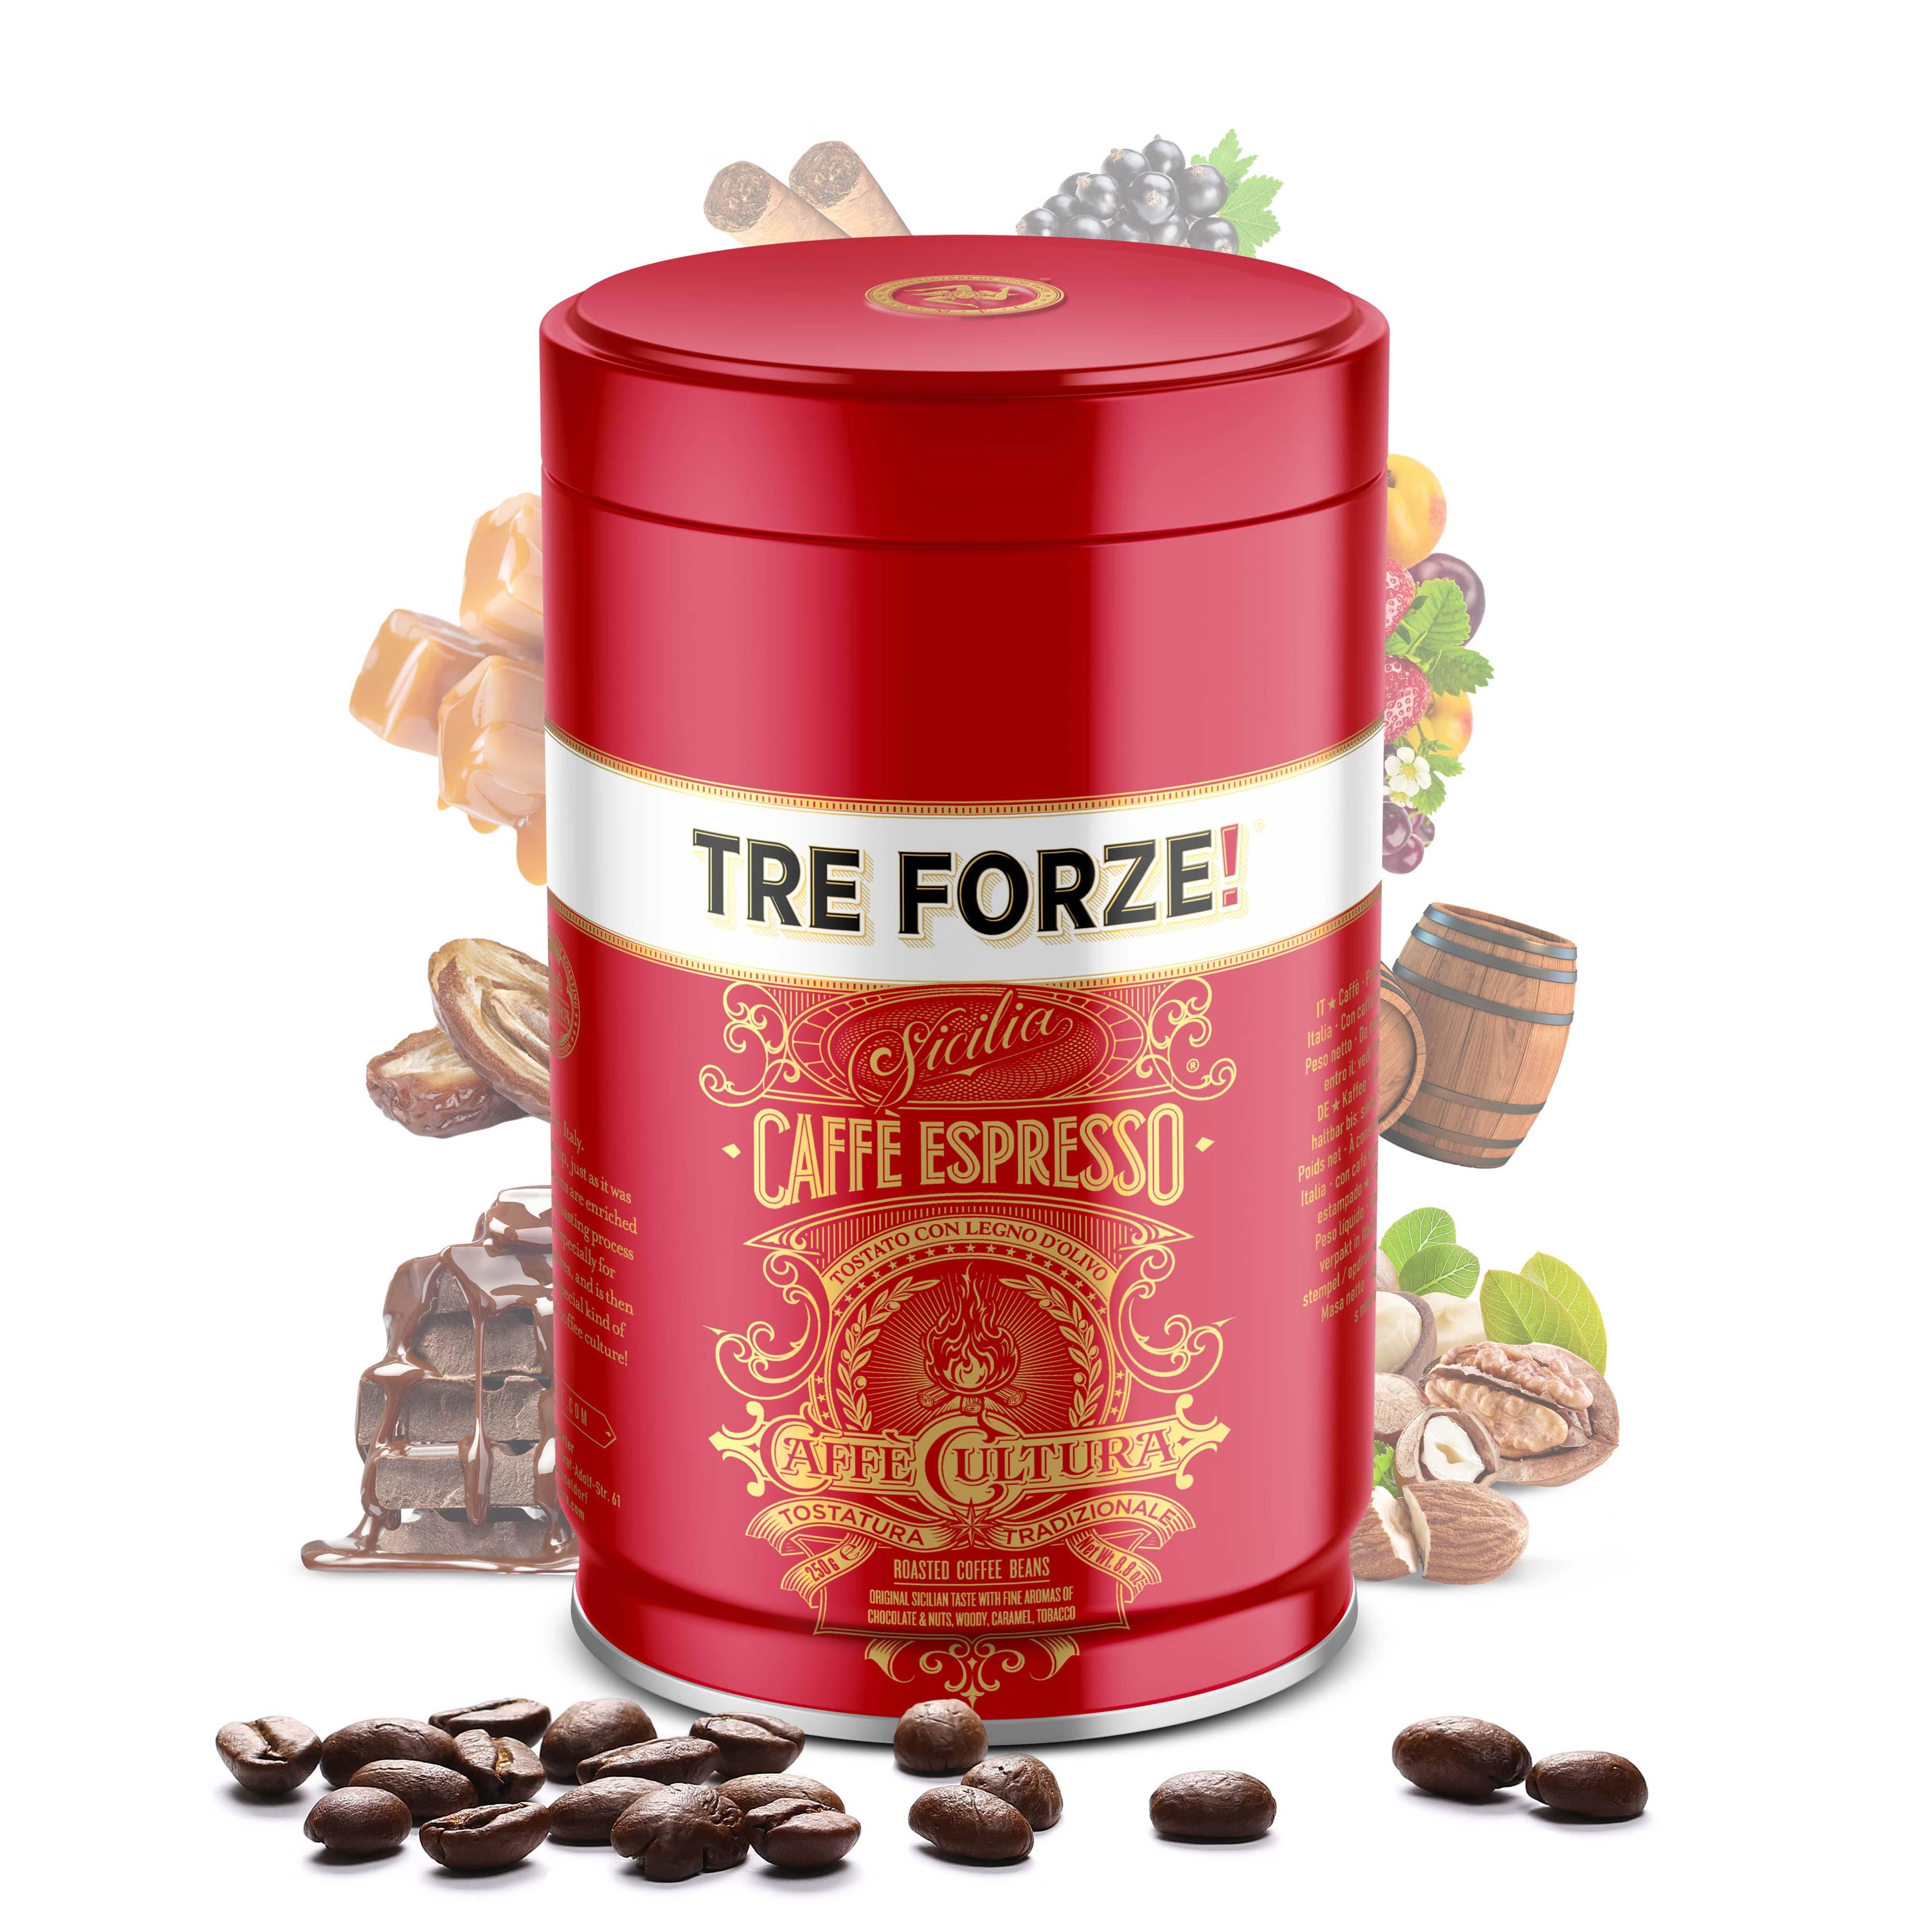 TRE FORZE! - Caffè Espresso - 250g Bohnen